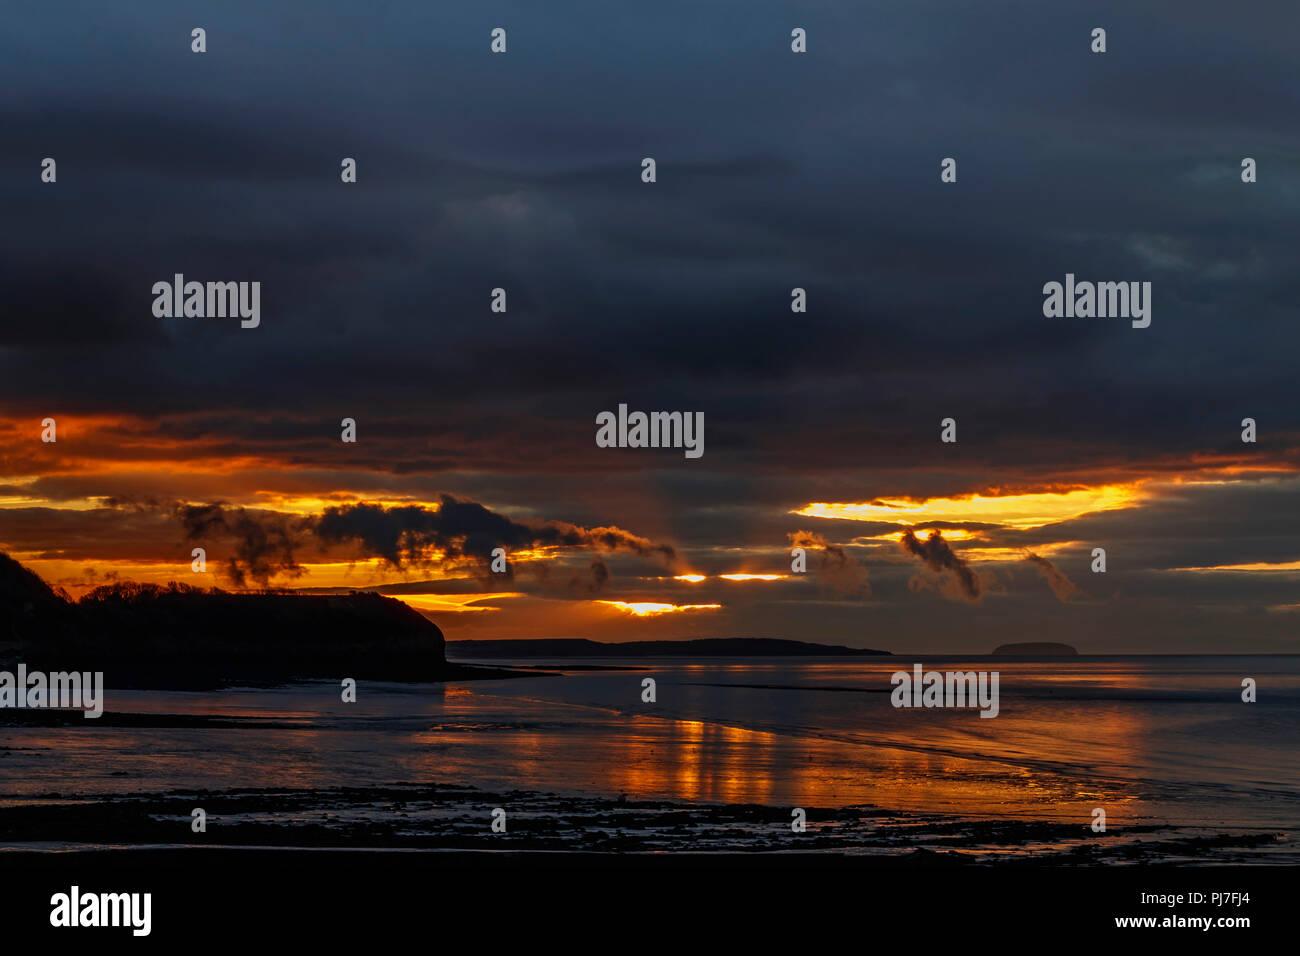 Sunlight reflecting onto the Clevedon mud - Stock Image